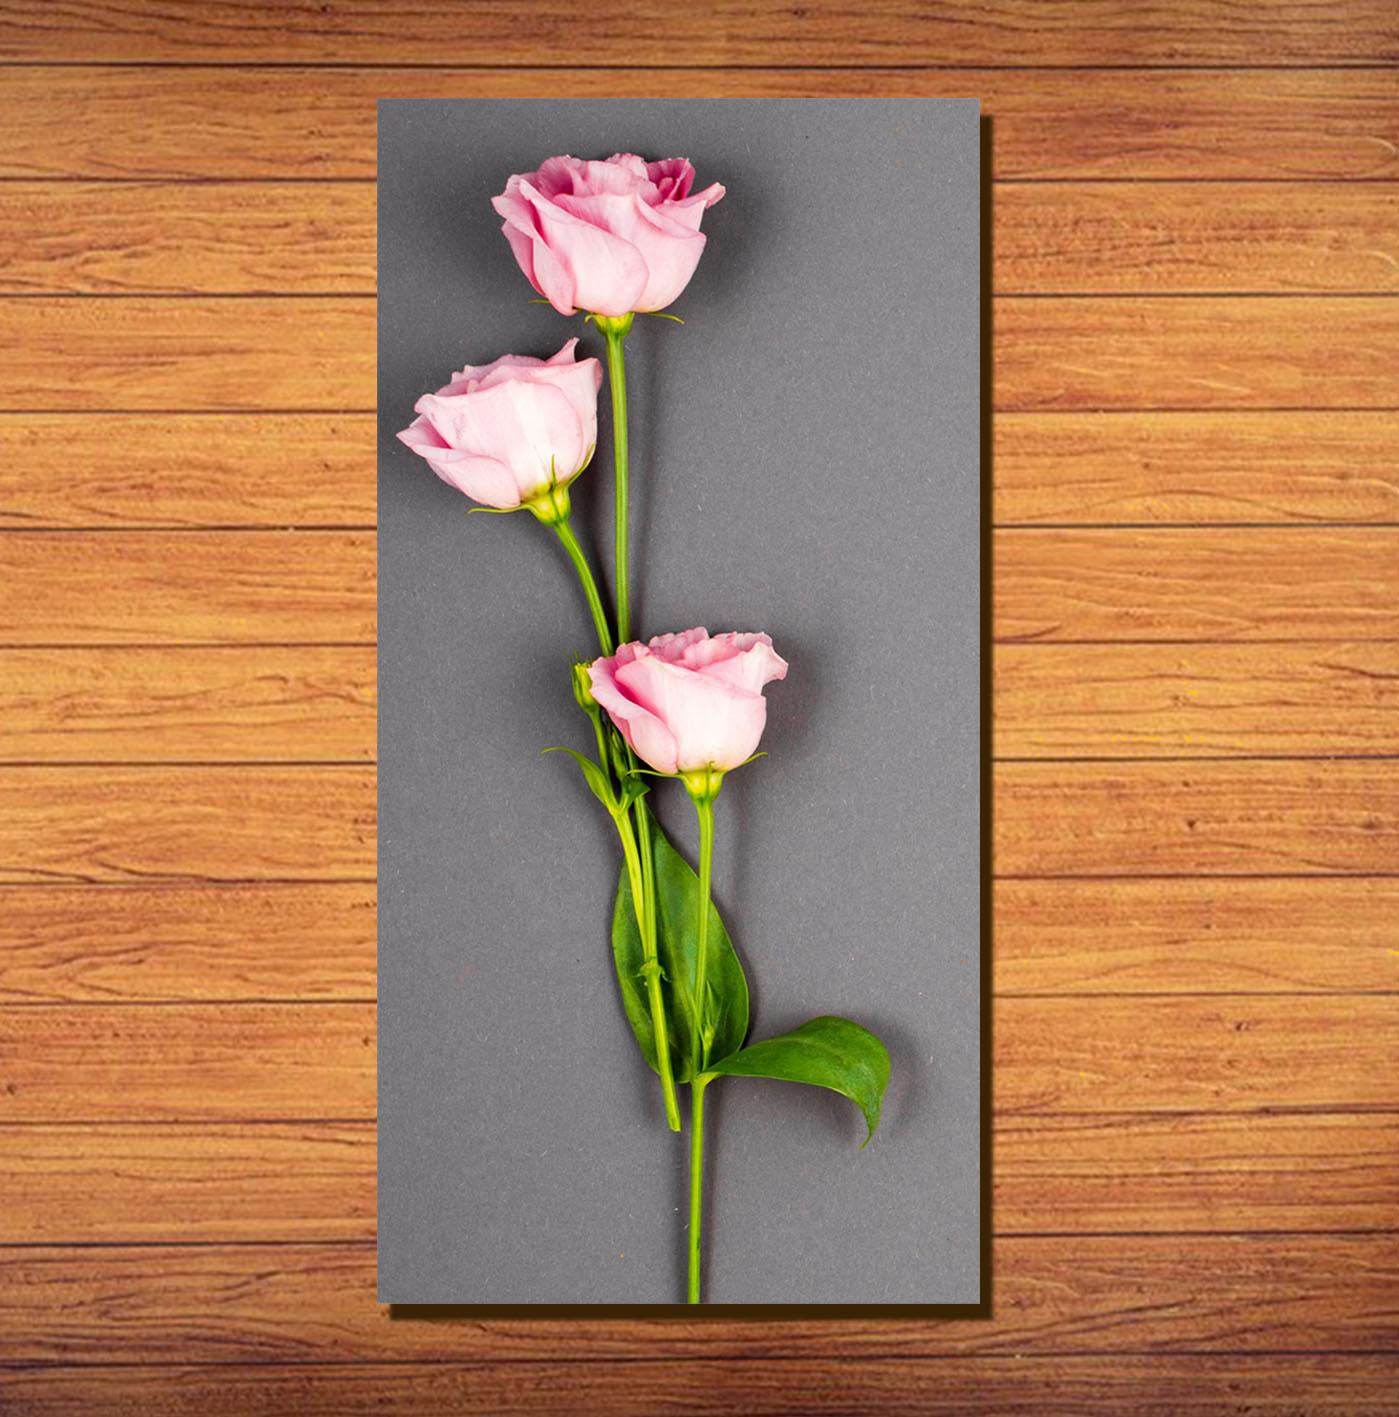 Dekorasi Rumah Hiasan Dinding Bunga Pink 3 Tangkai Lazada Indonesia